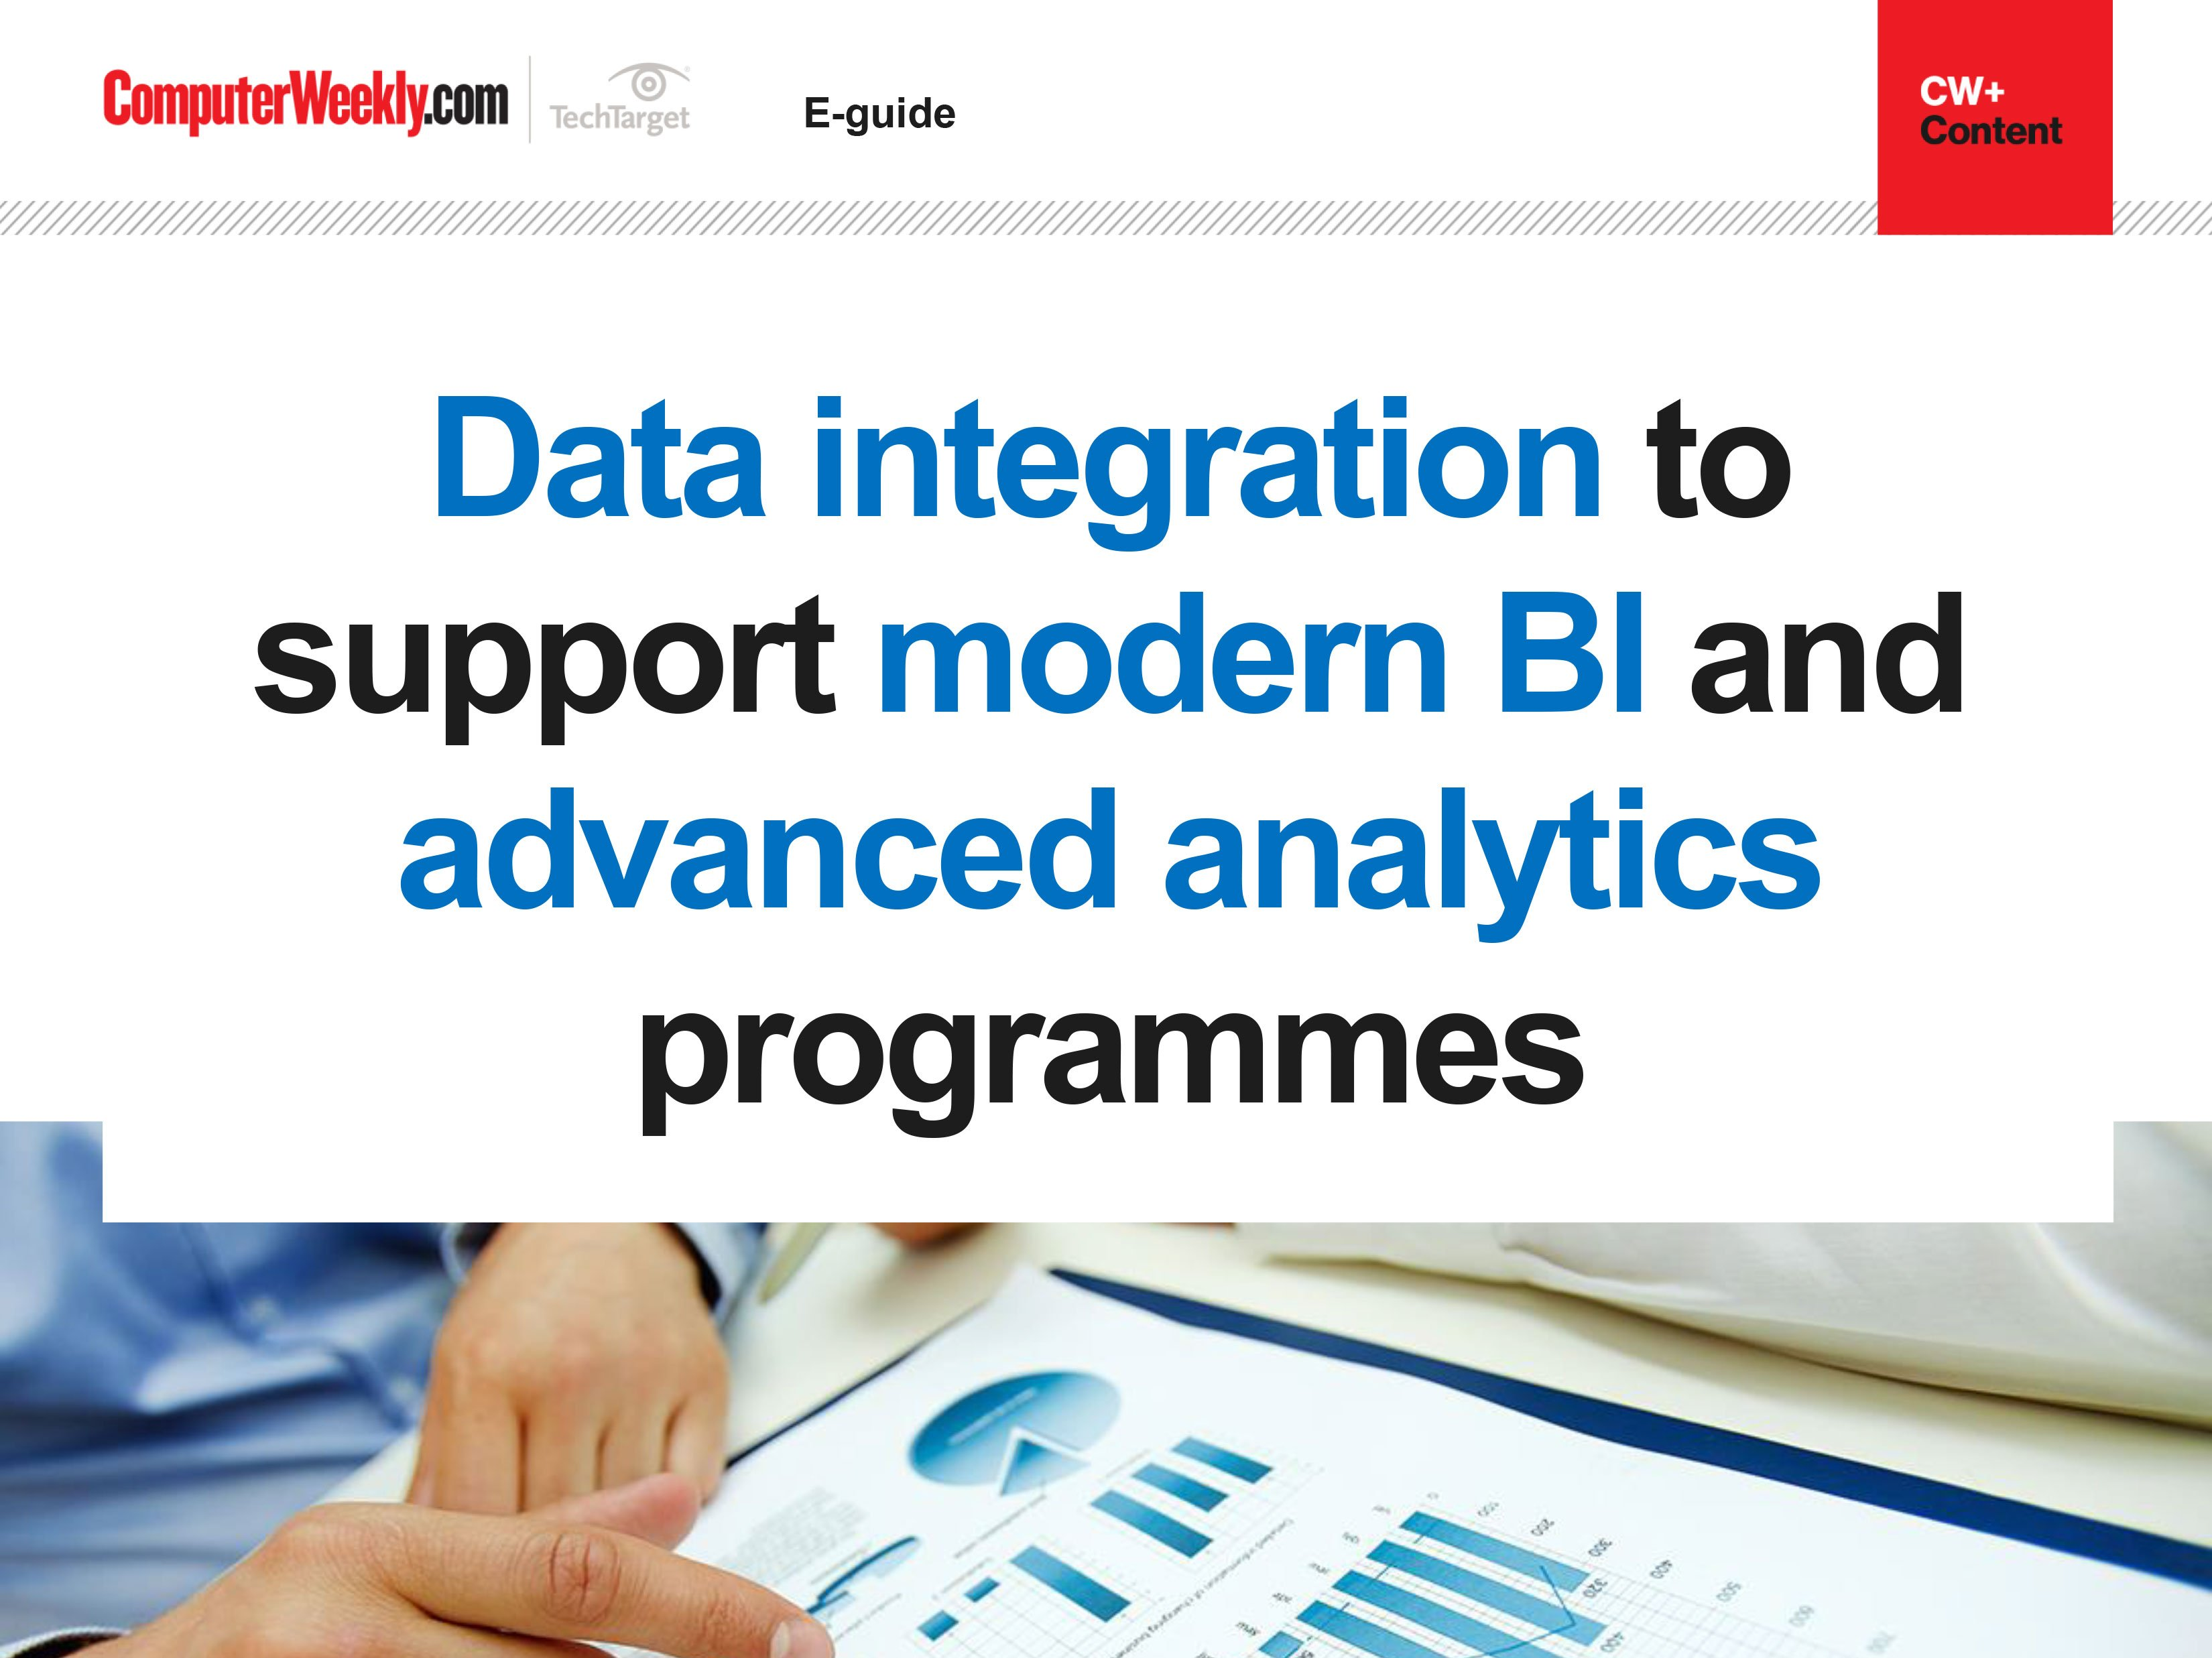 Data integration to support modern BI and advanced analytics programmes